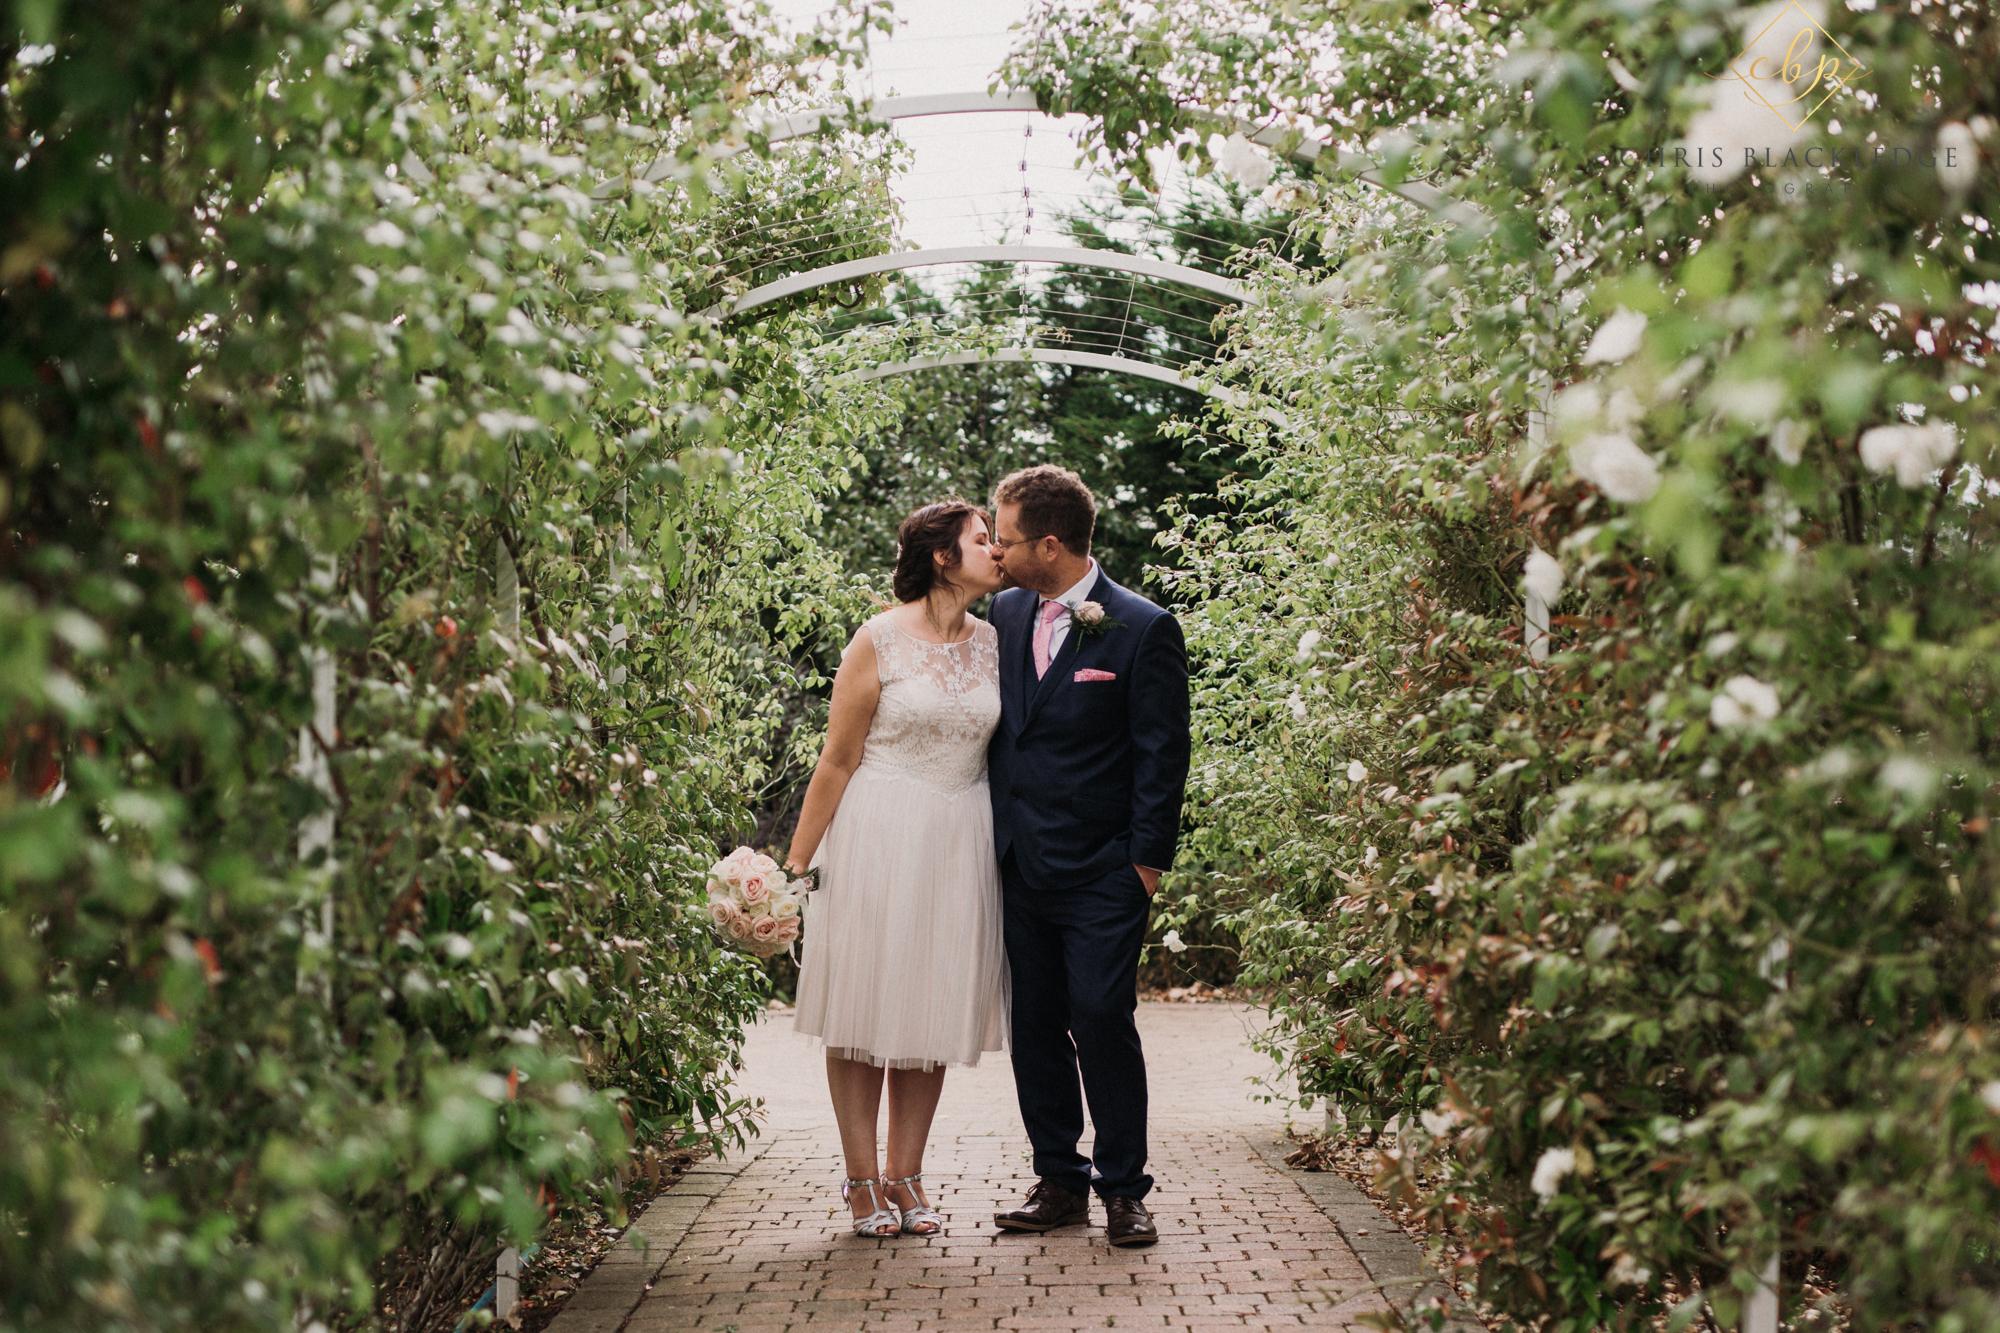 ferry_house_inn_wedding_photographer87.jpg